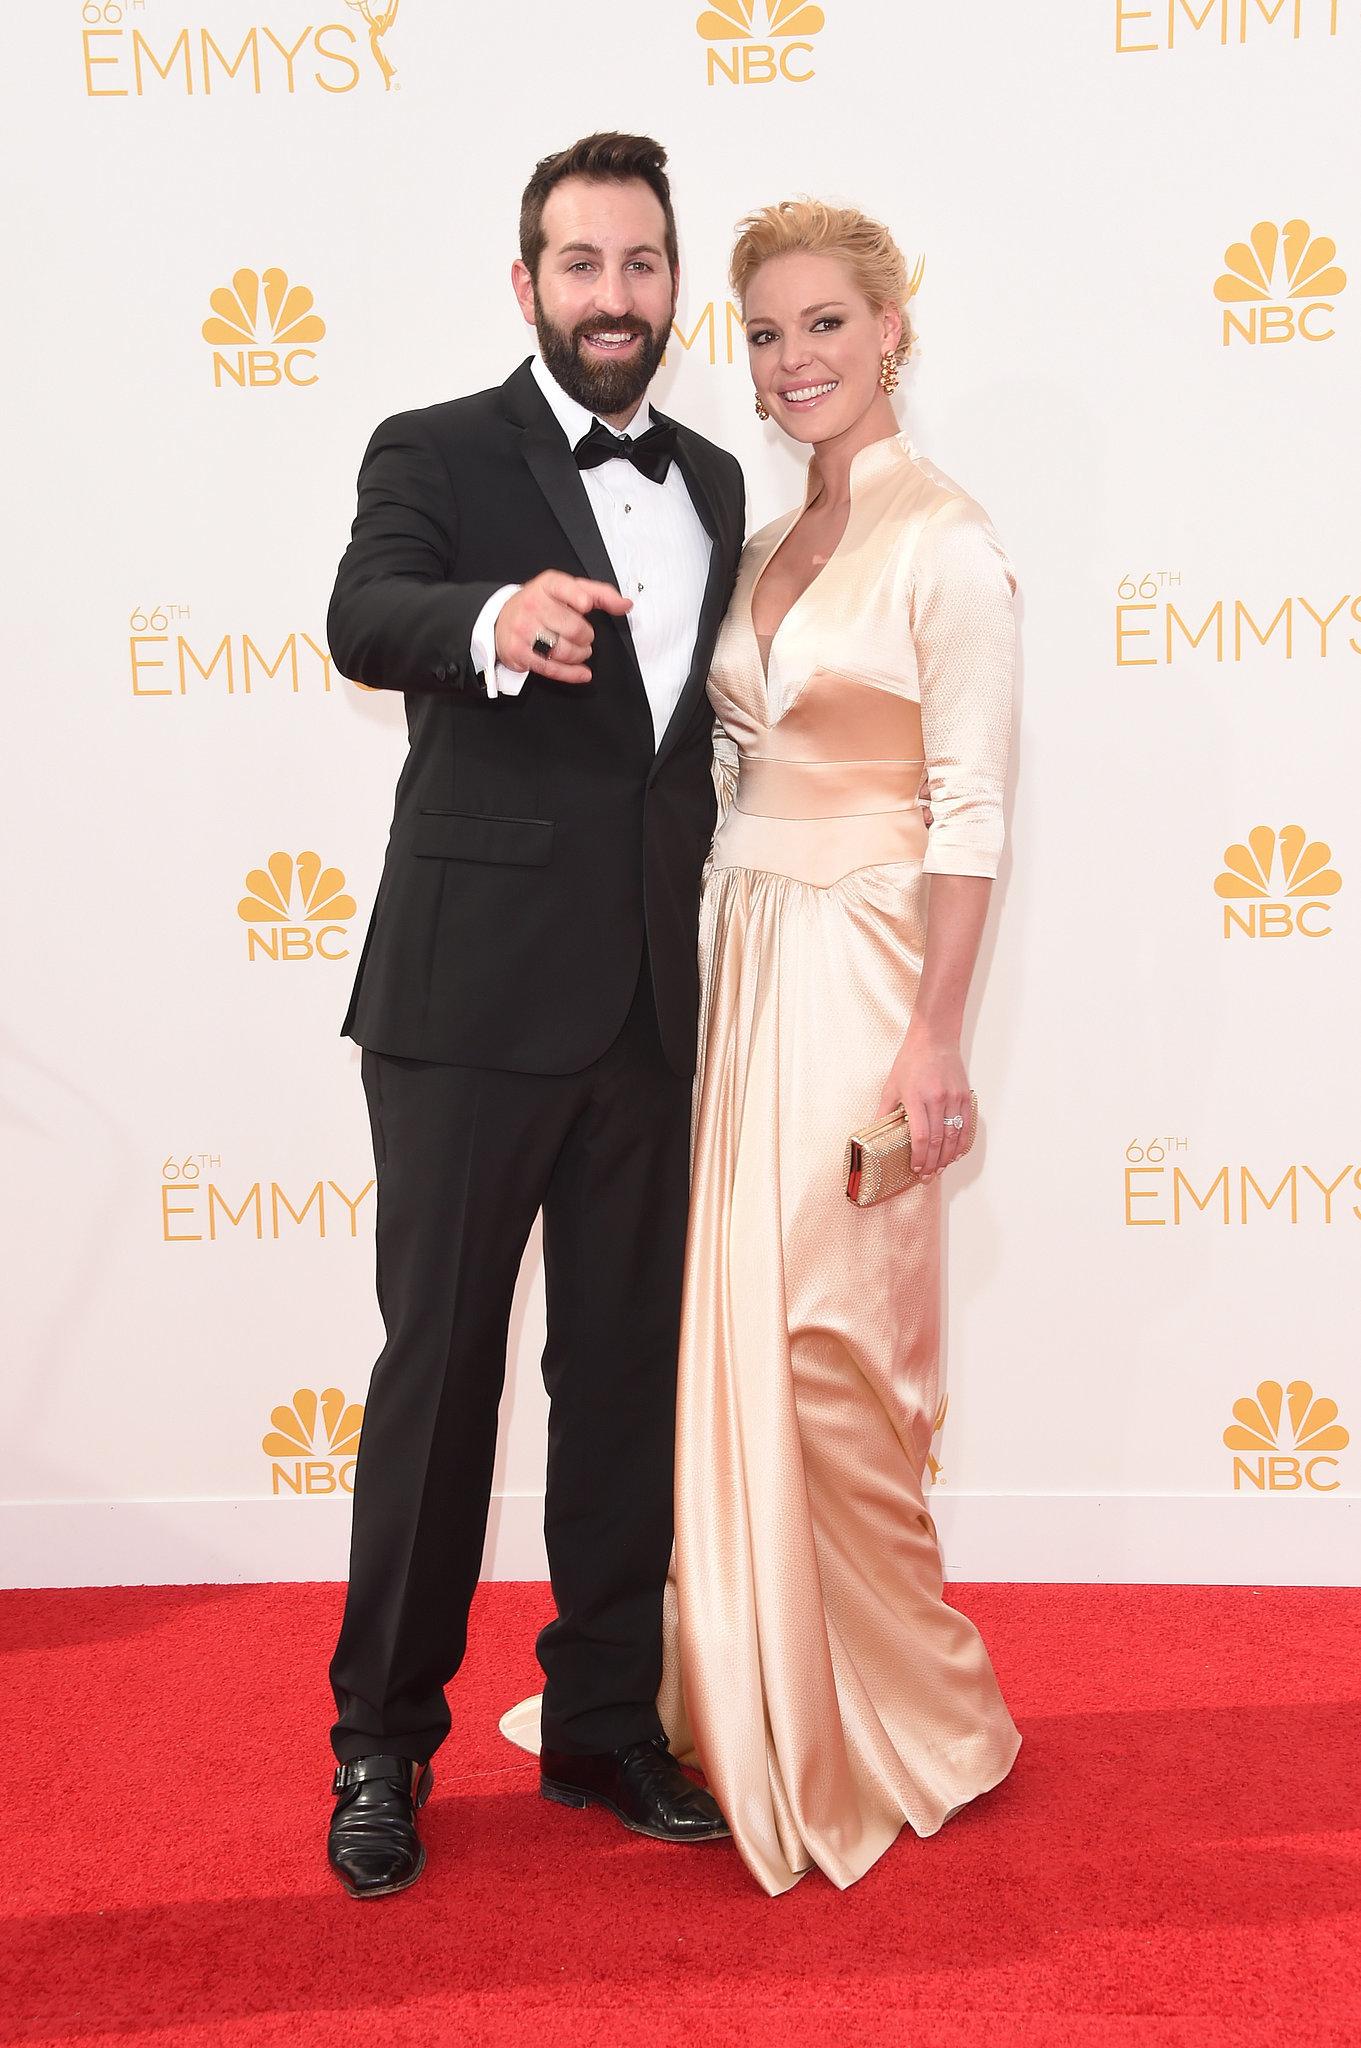 Josh Kelley and Katherine Heigl at the 2014 Emmy Awards